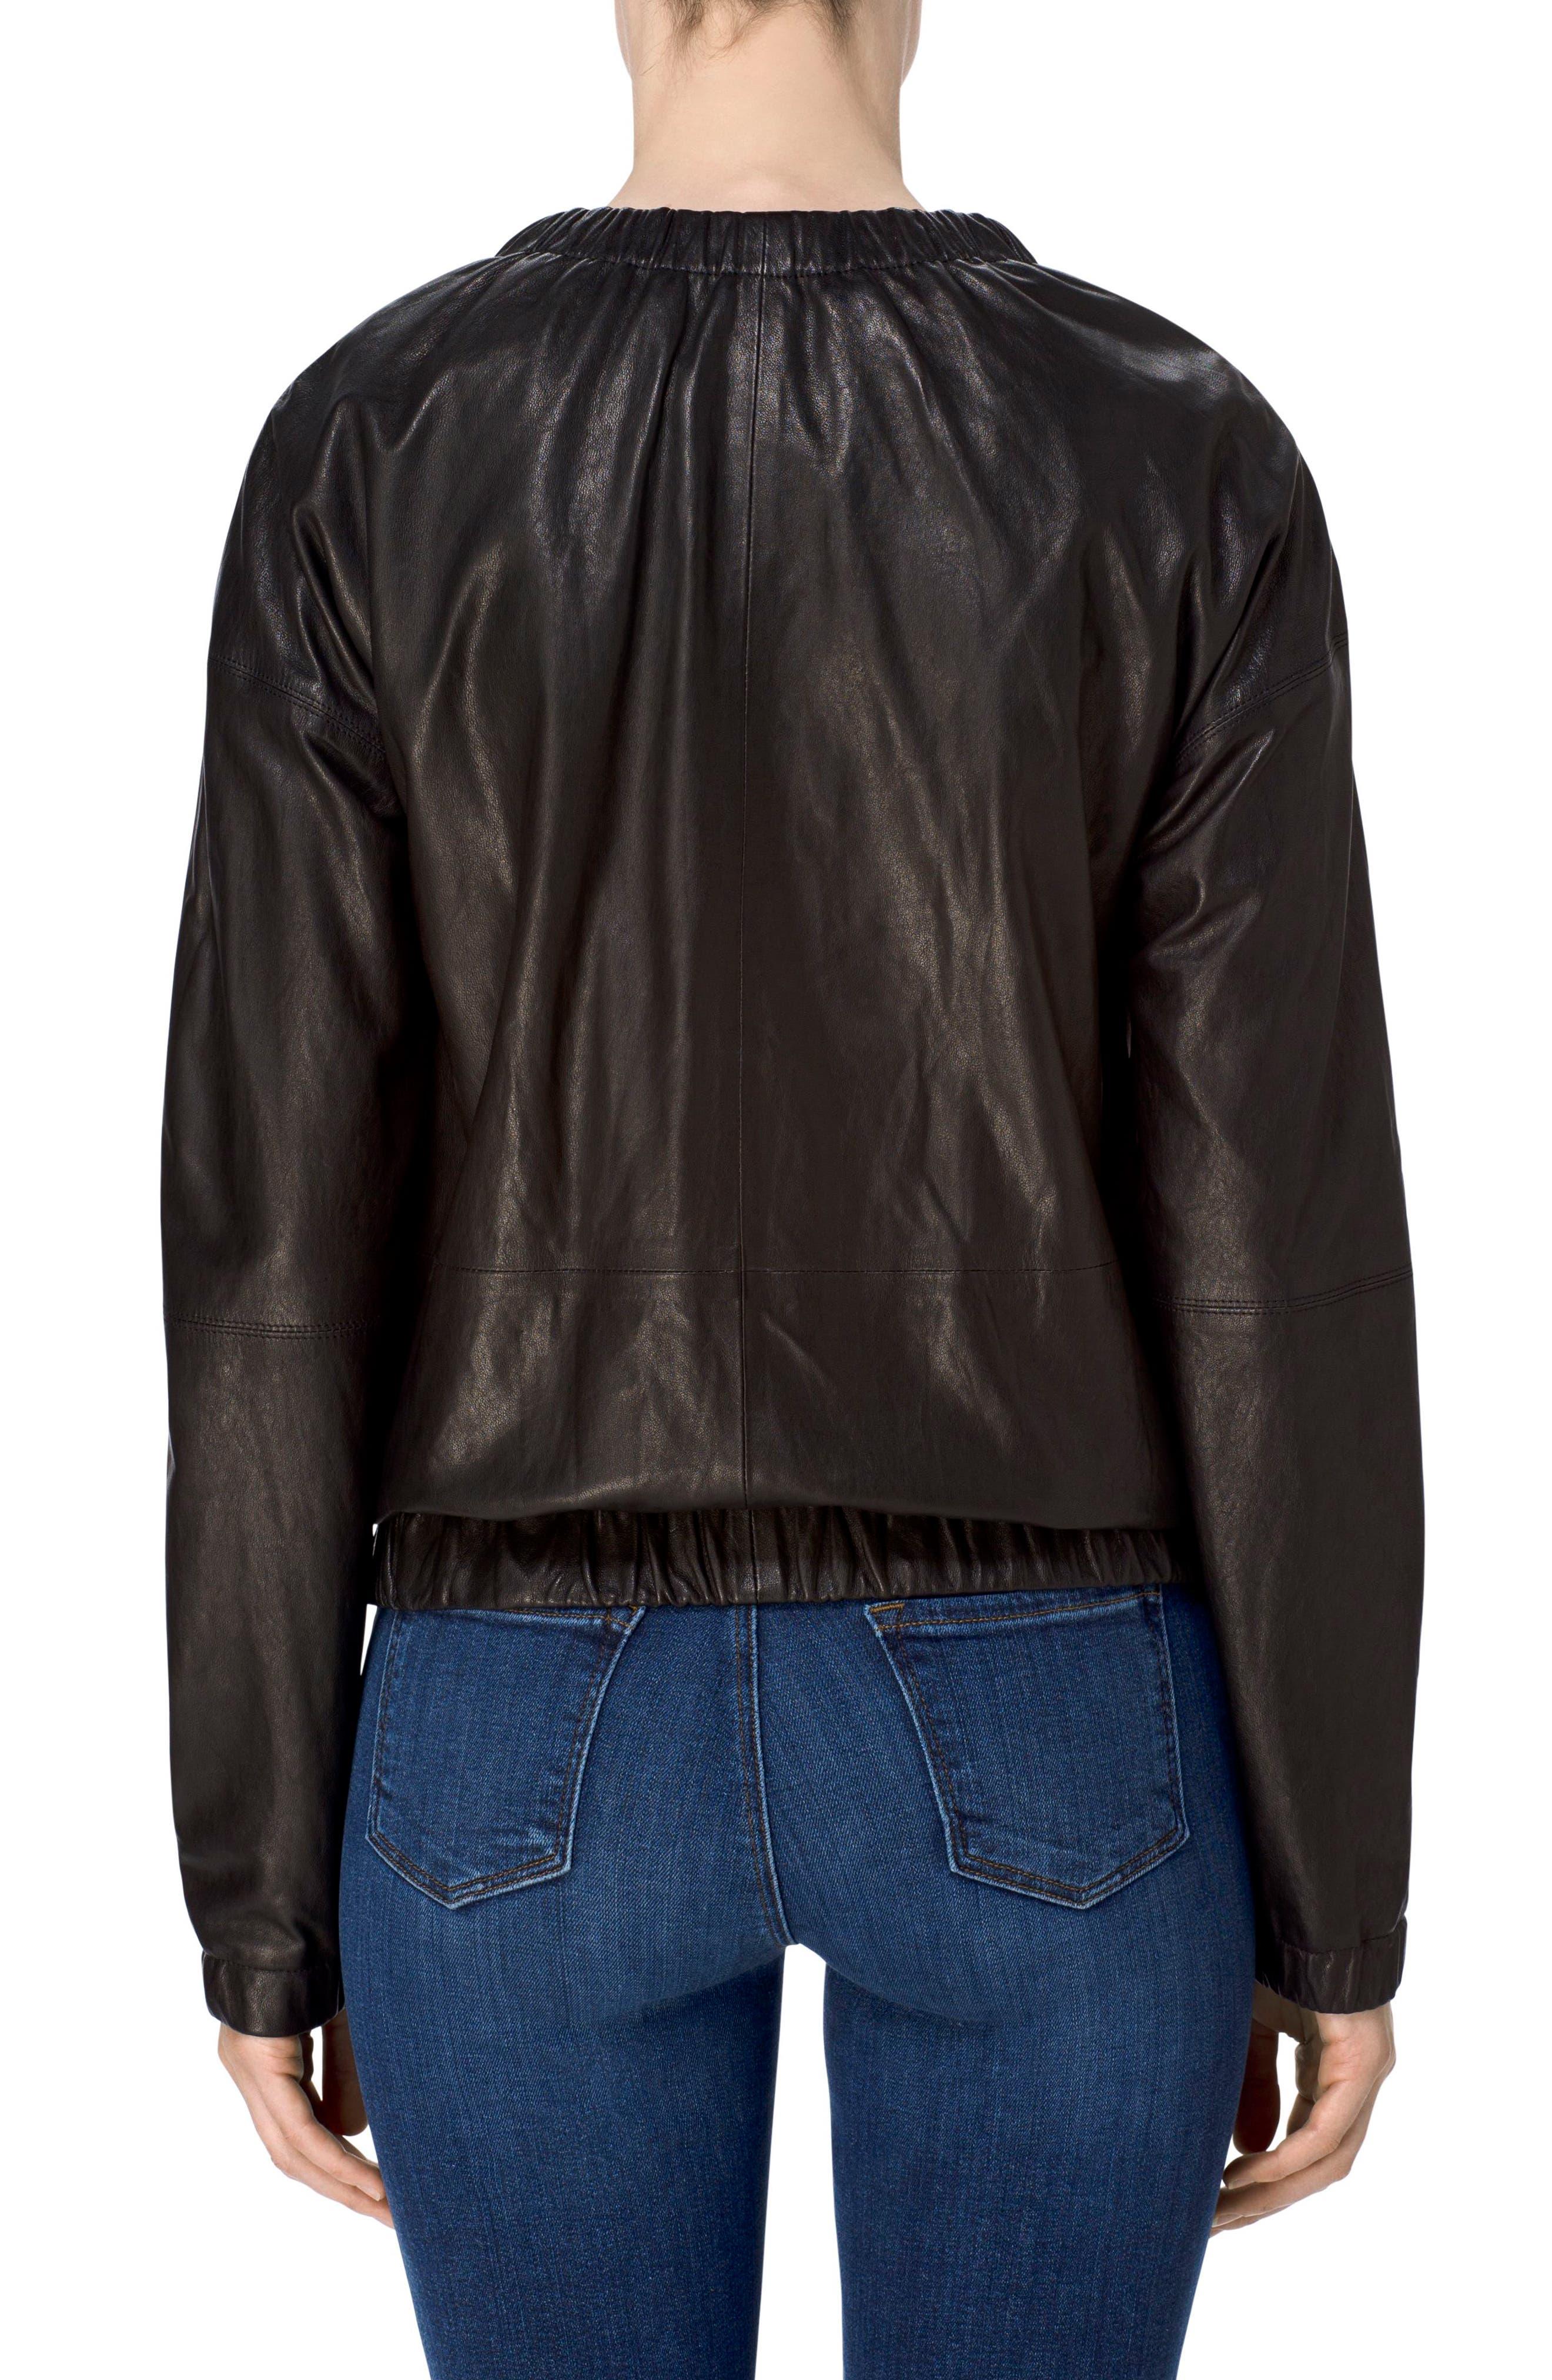 Baez Leather Bomber Jacket,                             Alternate thumbnail 3, color,                             001